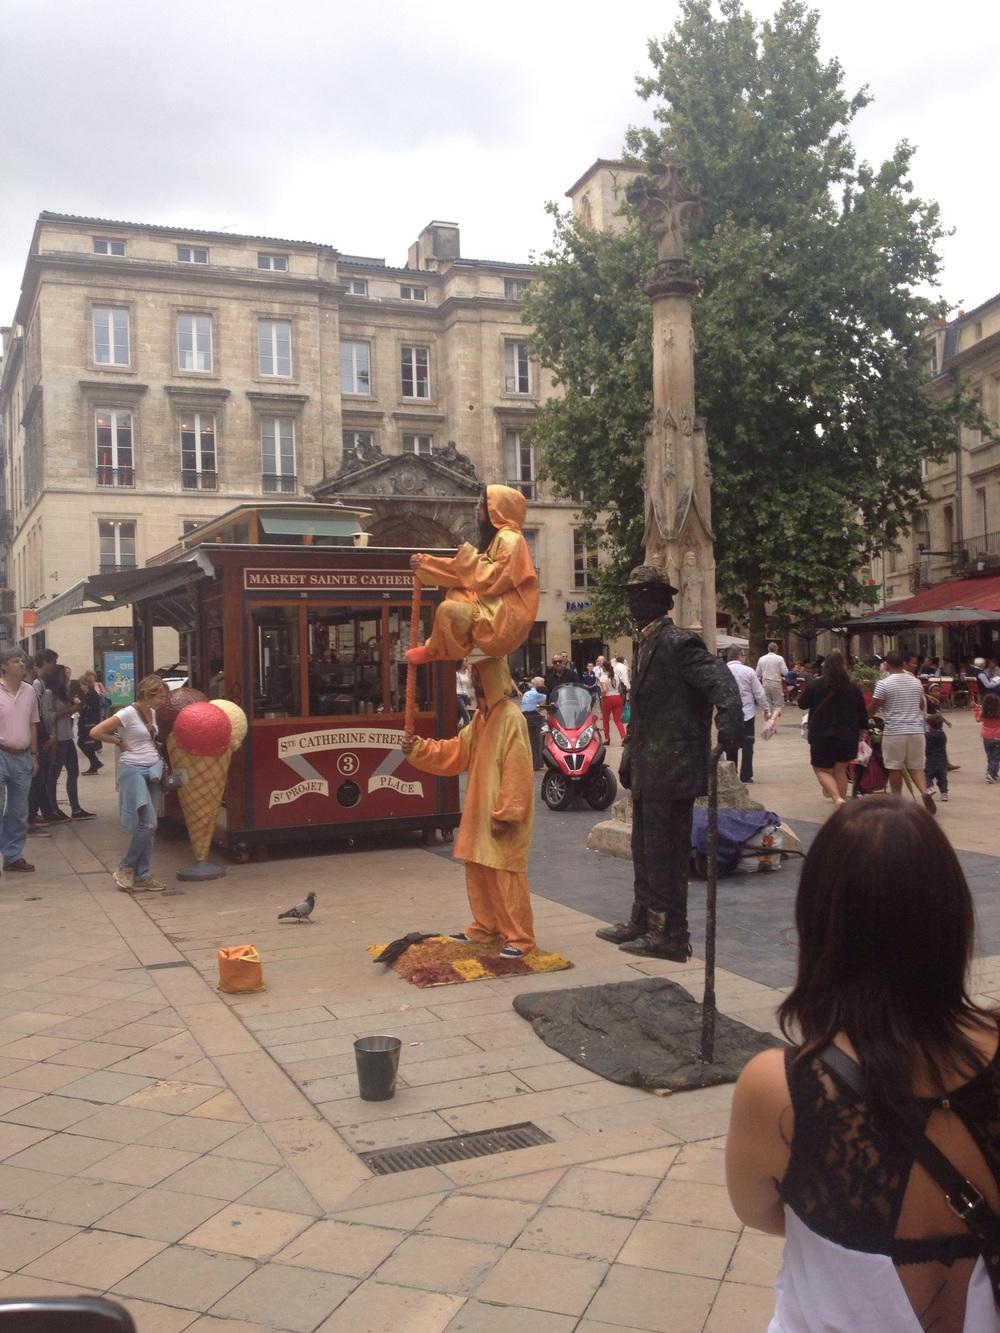 Levitating street performers!